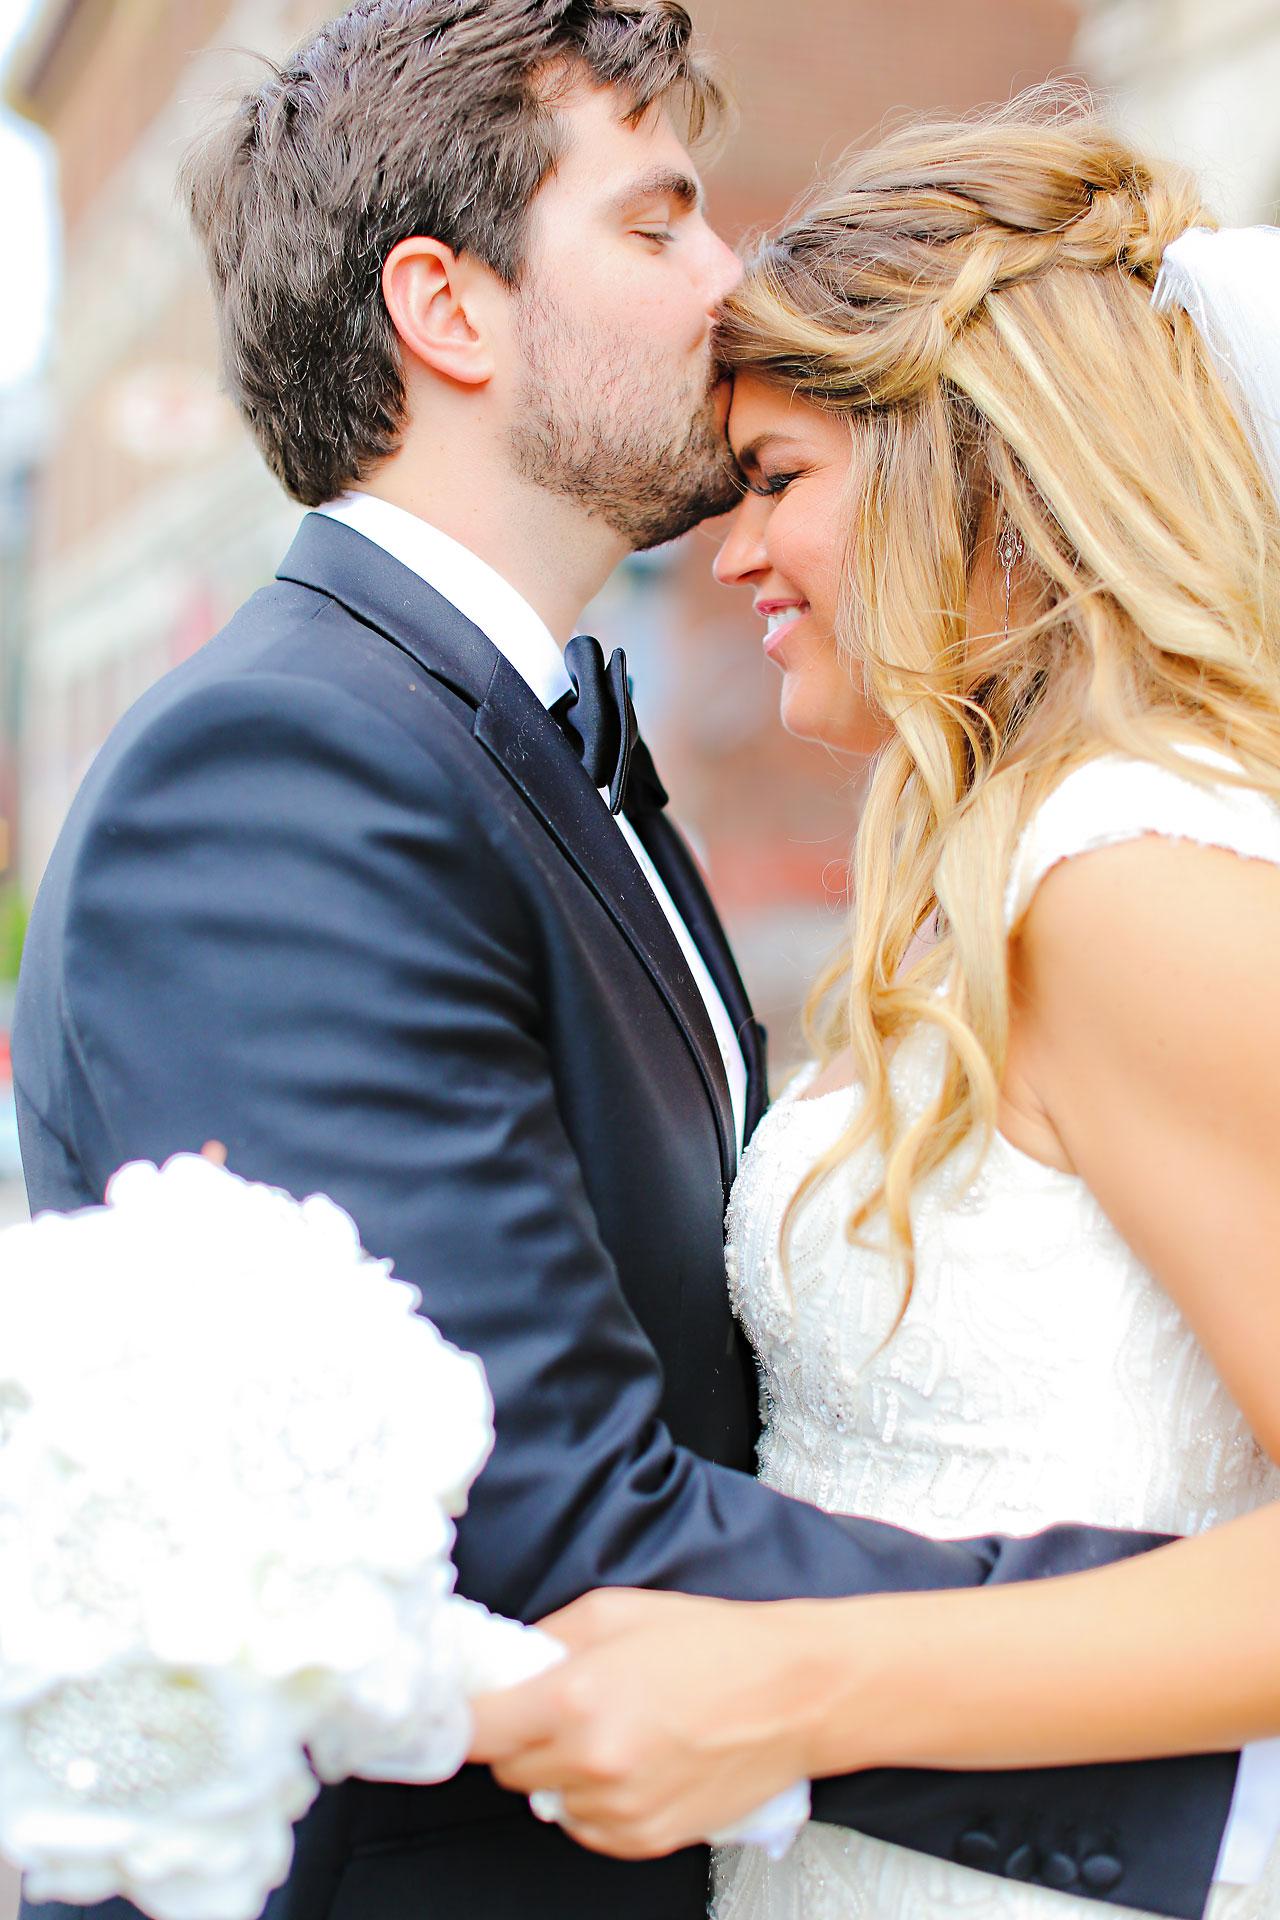 Amy Nick Canal 337 Wedding 091